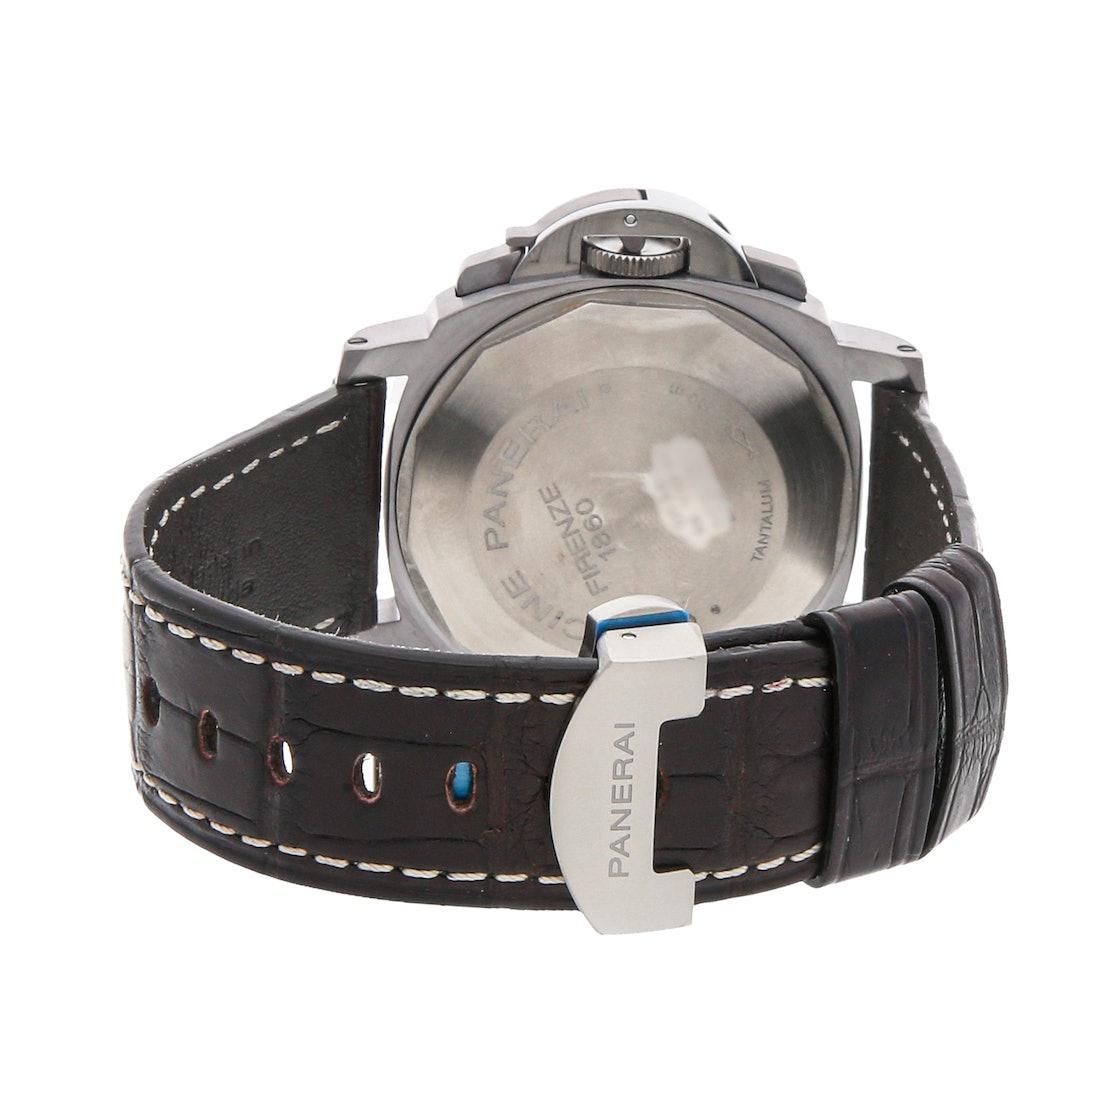 Panerai Luminor Chronograph Limited Edition PAM 192